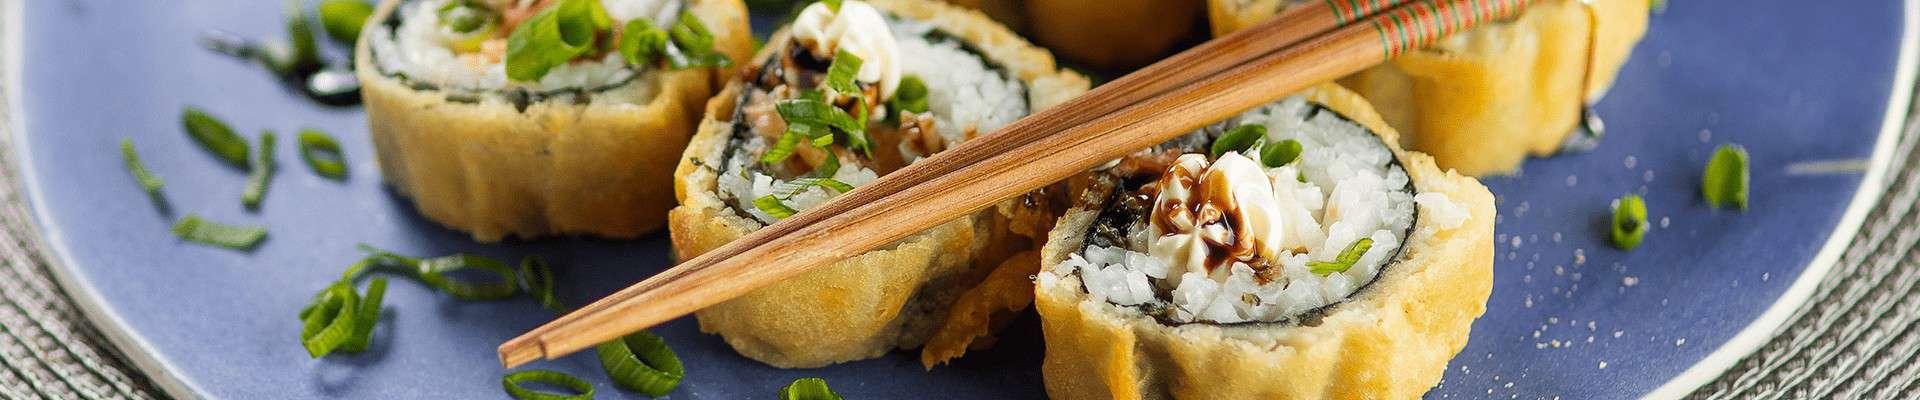 Hot Roll Maki Sushi com Cream Cheese Catupiry